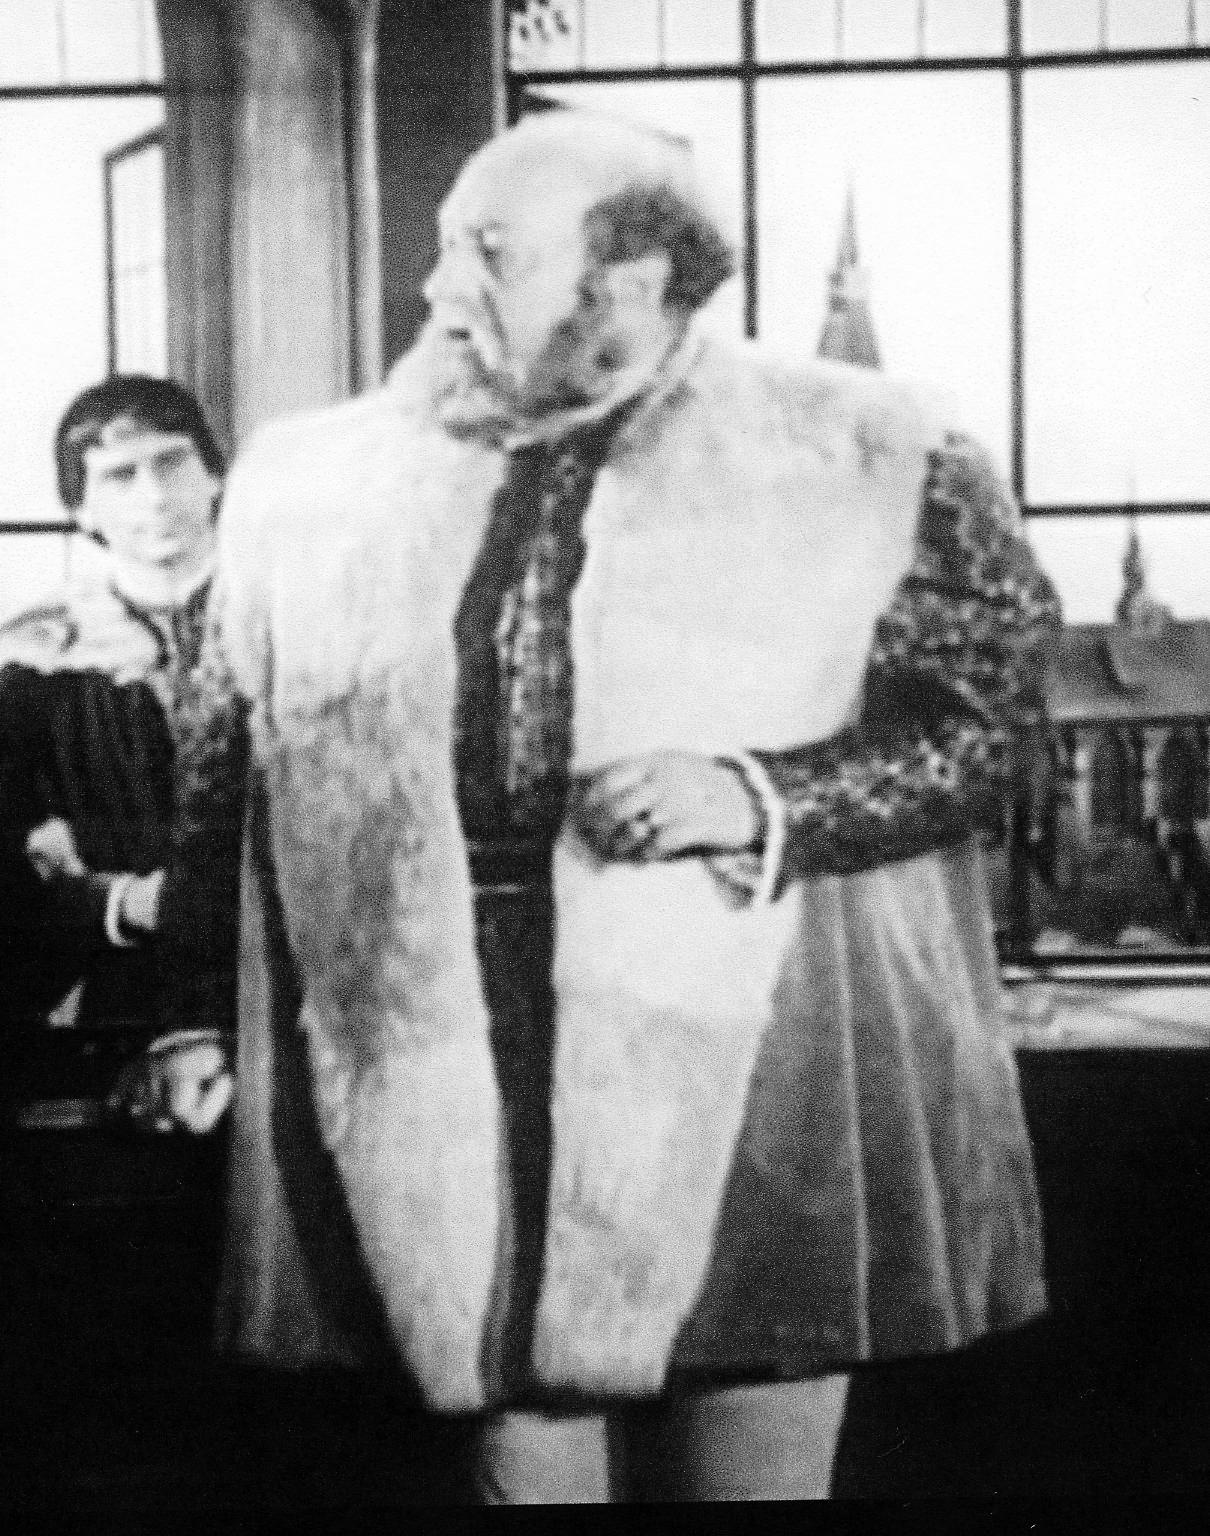 http://2.bp.blogspot.com/_5n4tf47qr9Q/TQMrFmWorHI/AAAAAAAAAJI/NnT9FlDRlPs/s1600/movie+Luther+1953+Horne+as+FtWe.jpg